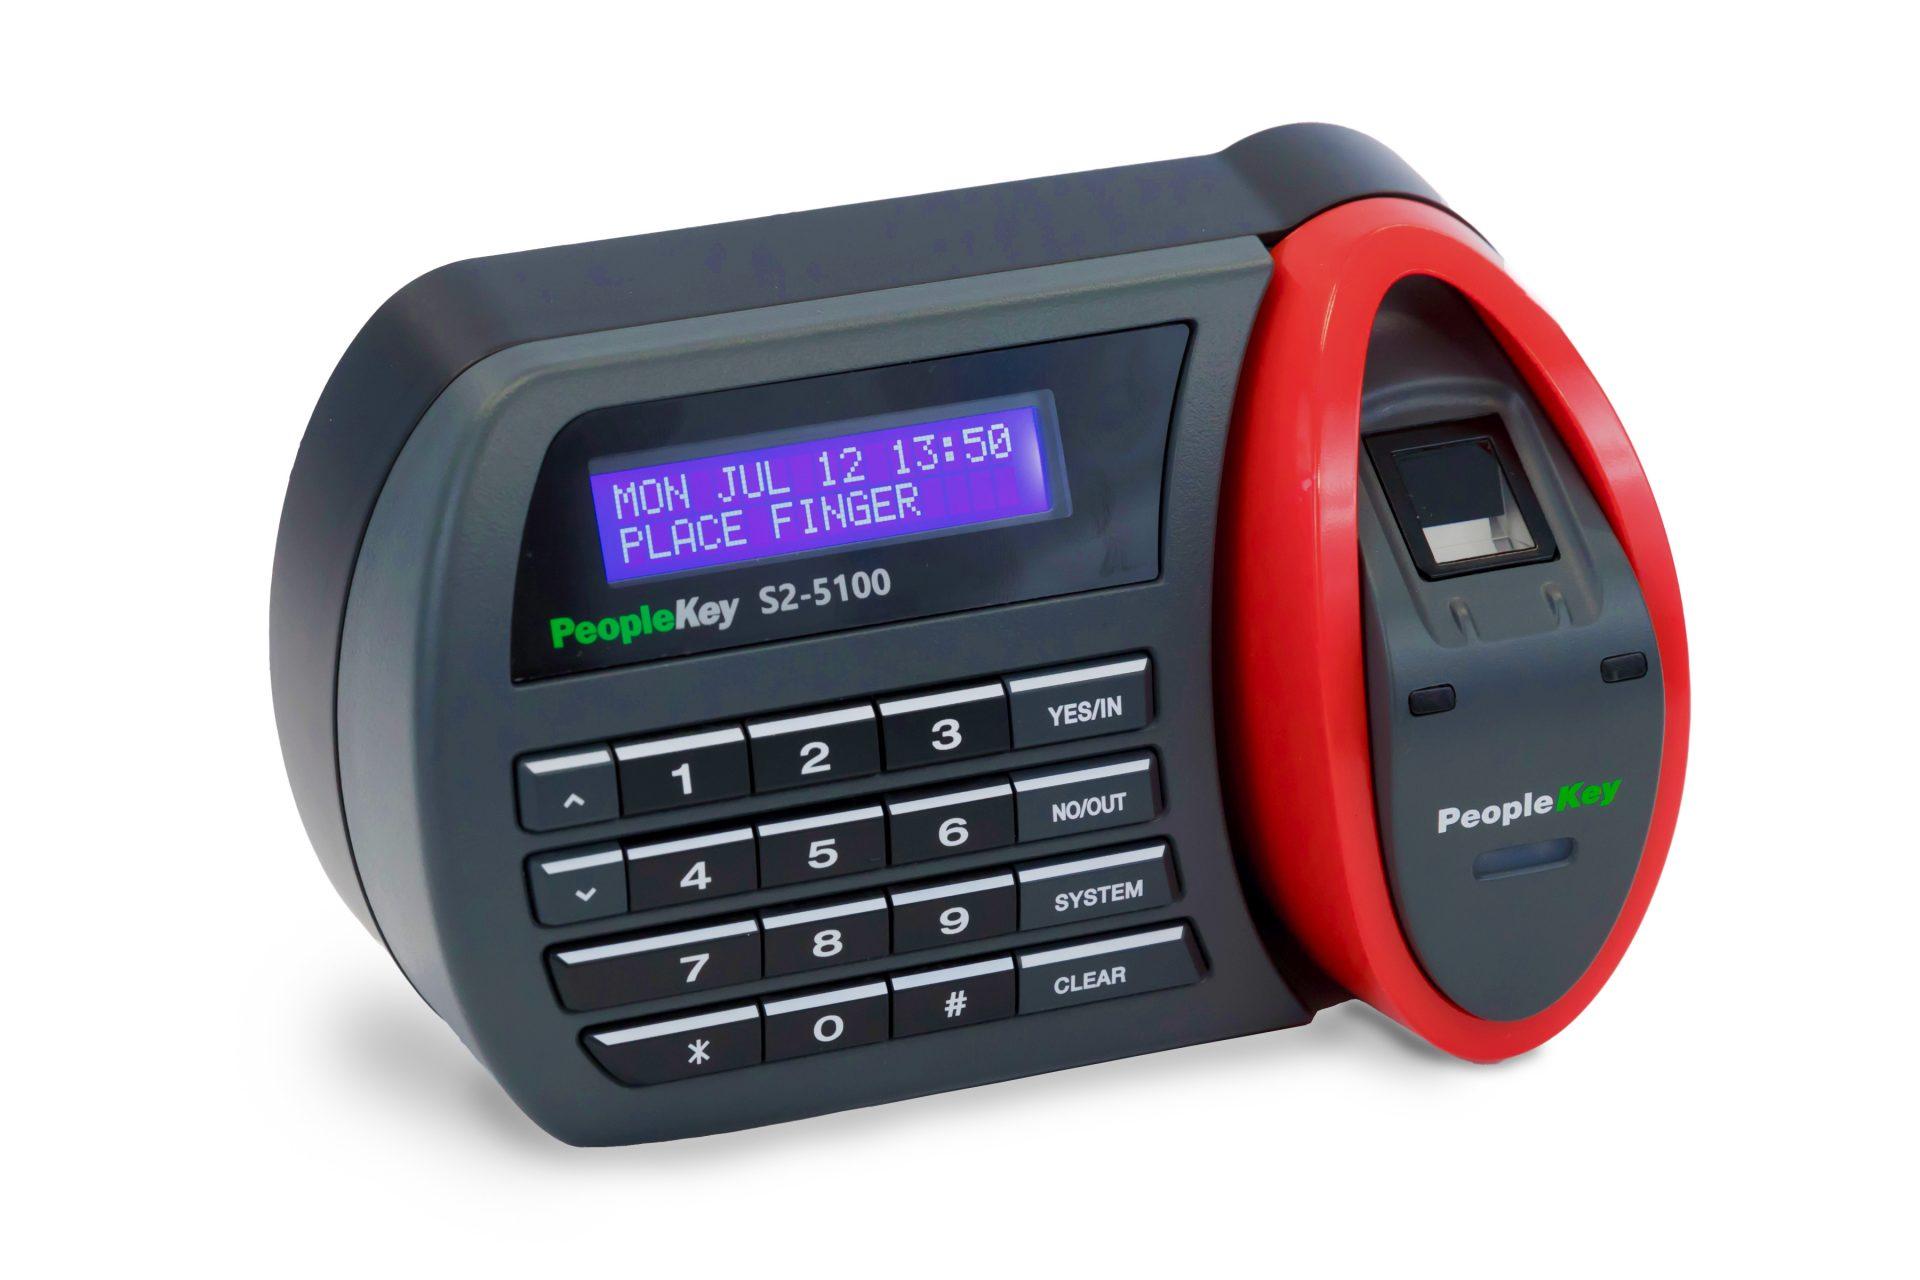 PeopleKey Secure device